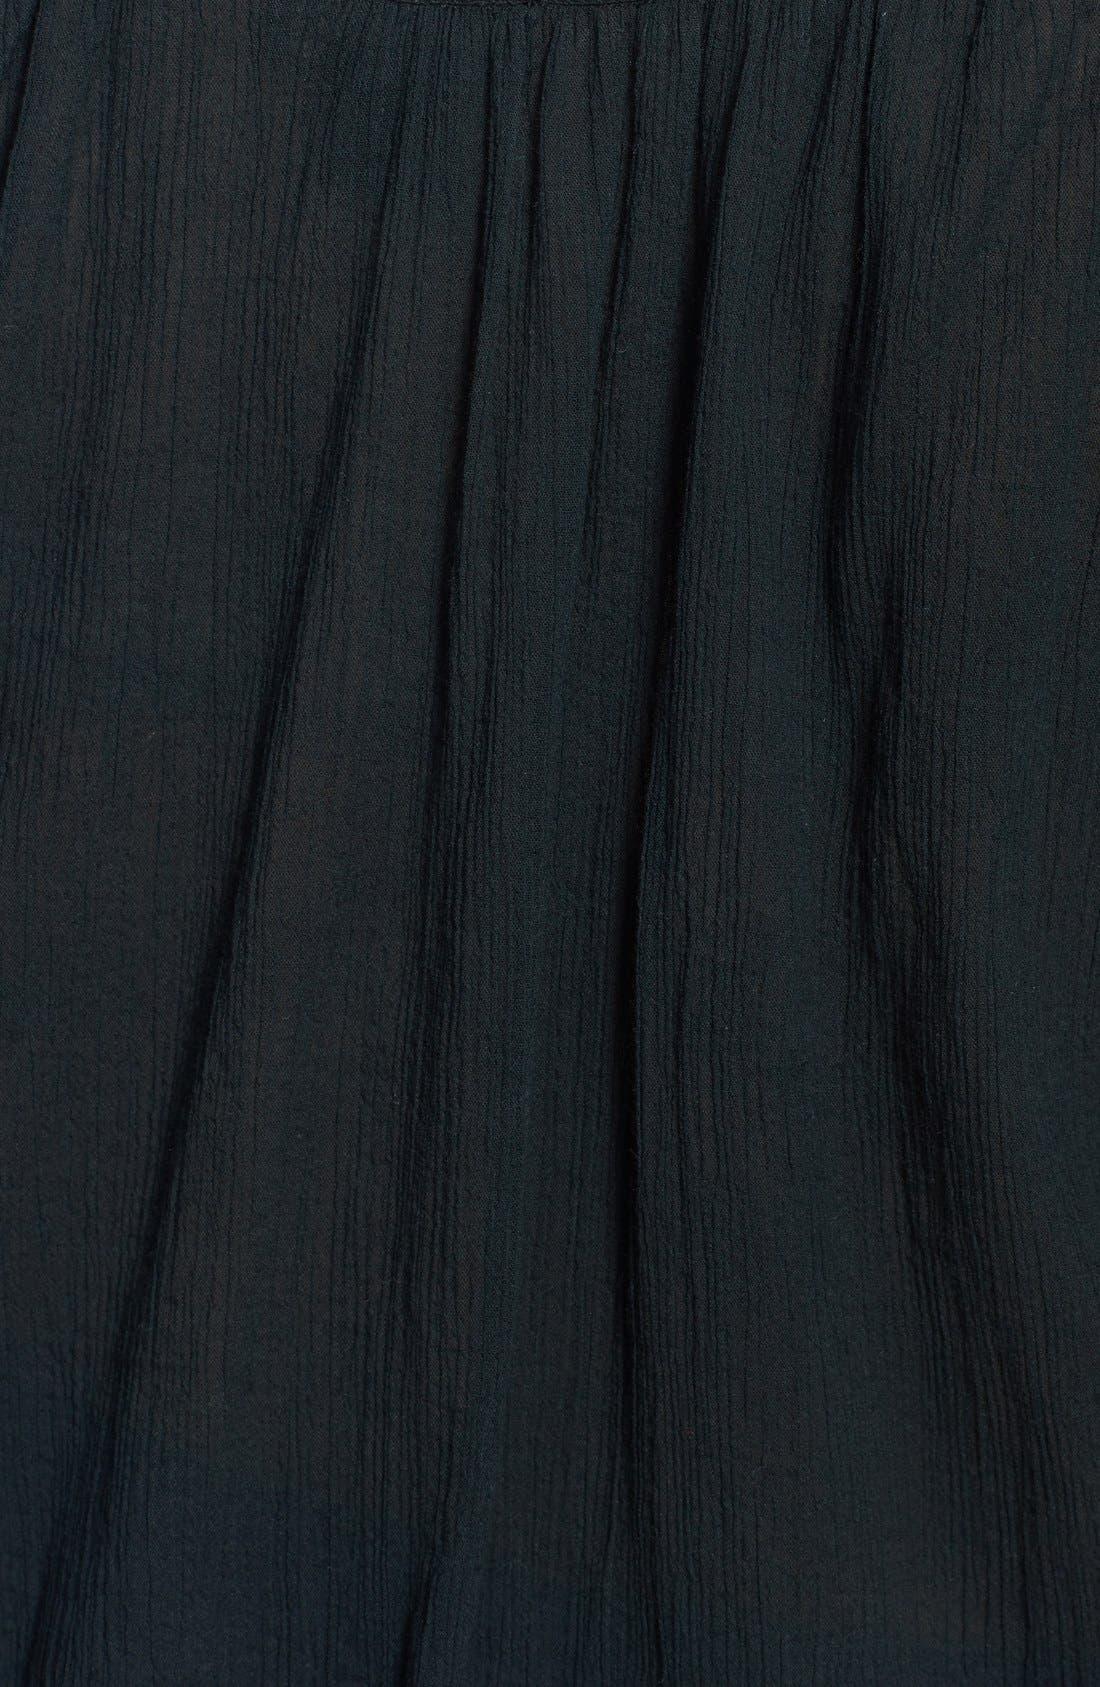 Alternate Image 3  - Lucky Brand Battenberg Lace Trim Top (Plus Size)